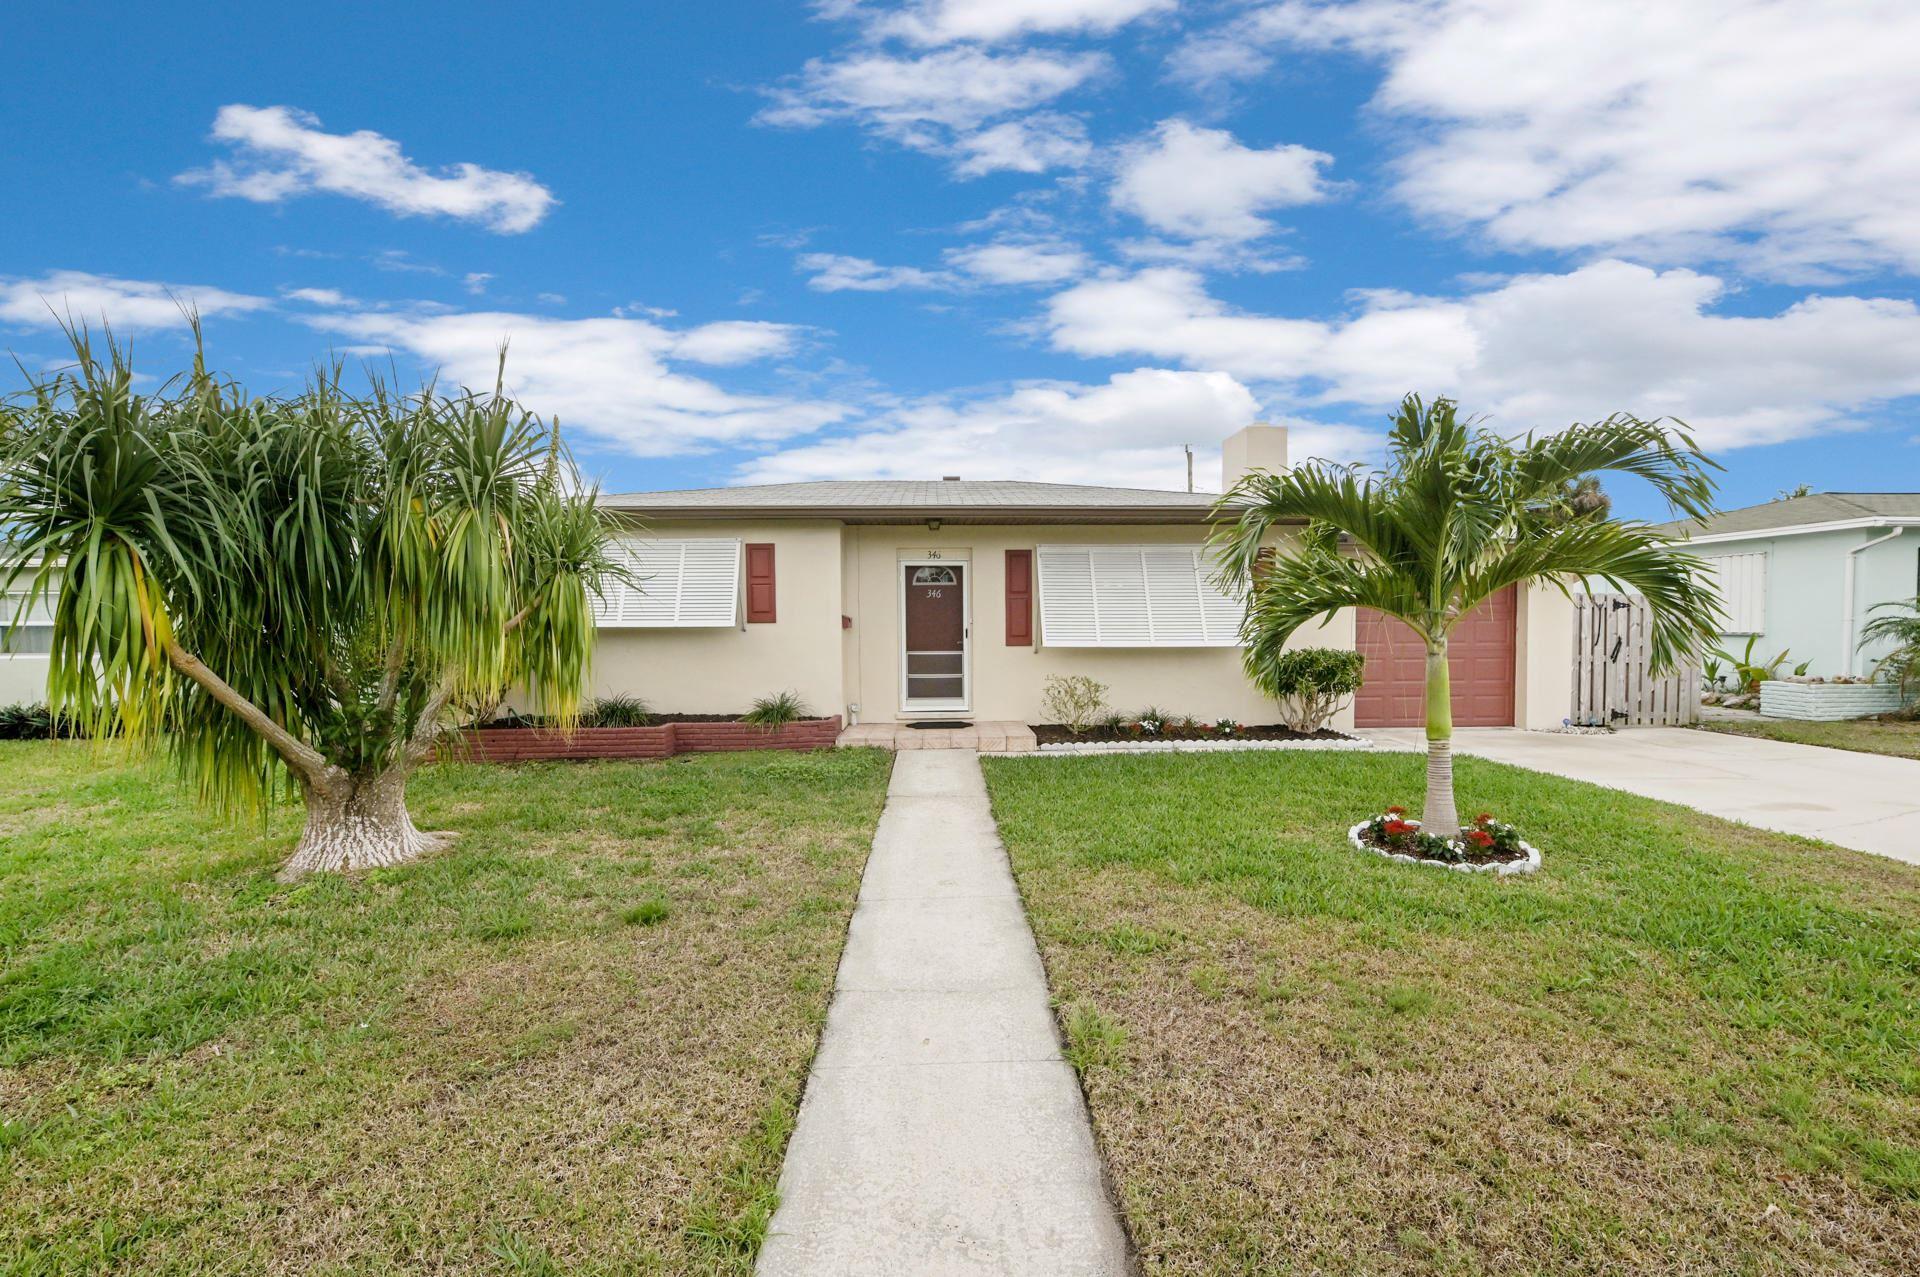 346 Laurie Road, West Palm Beach, FL 33405 - #: RX-10693405